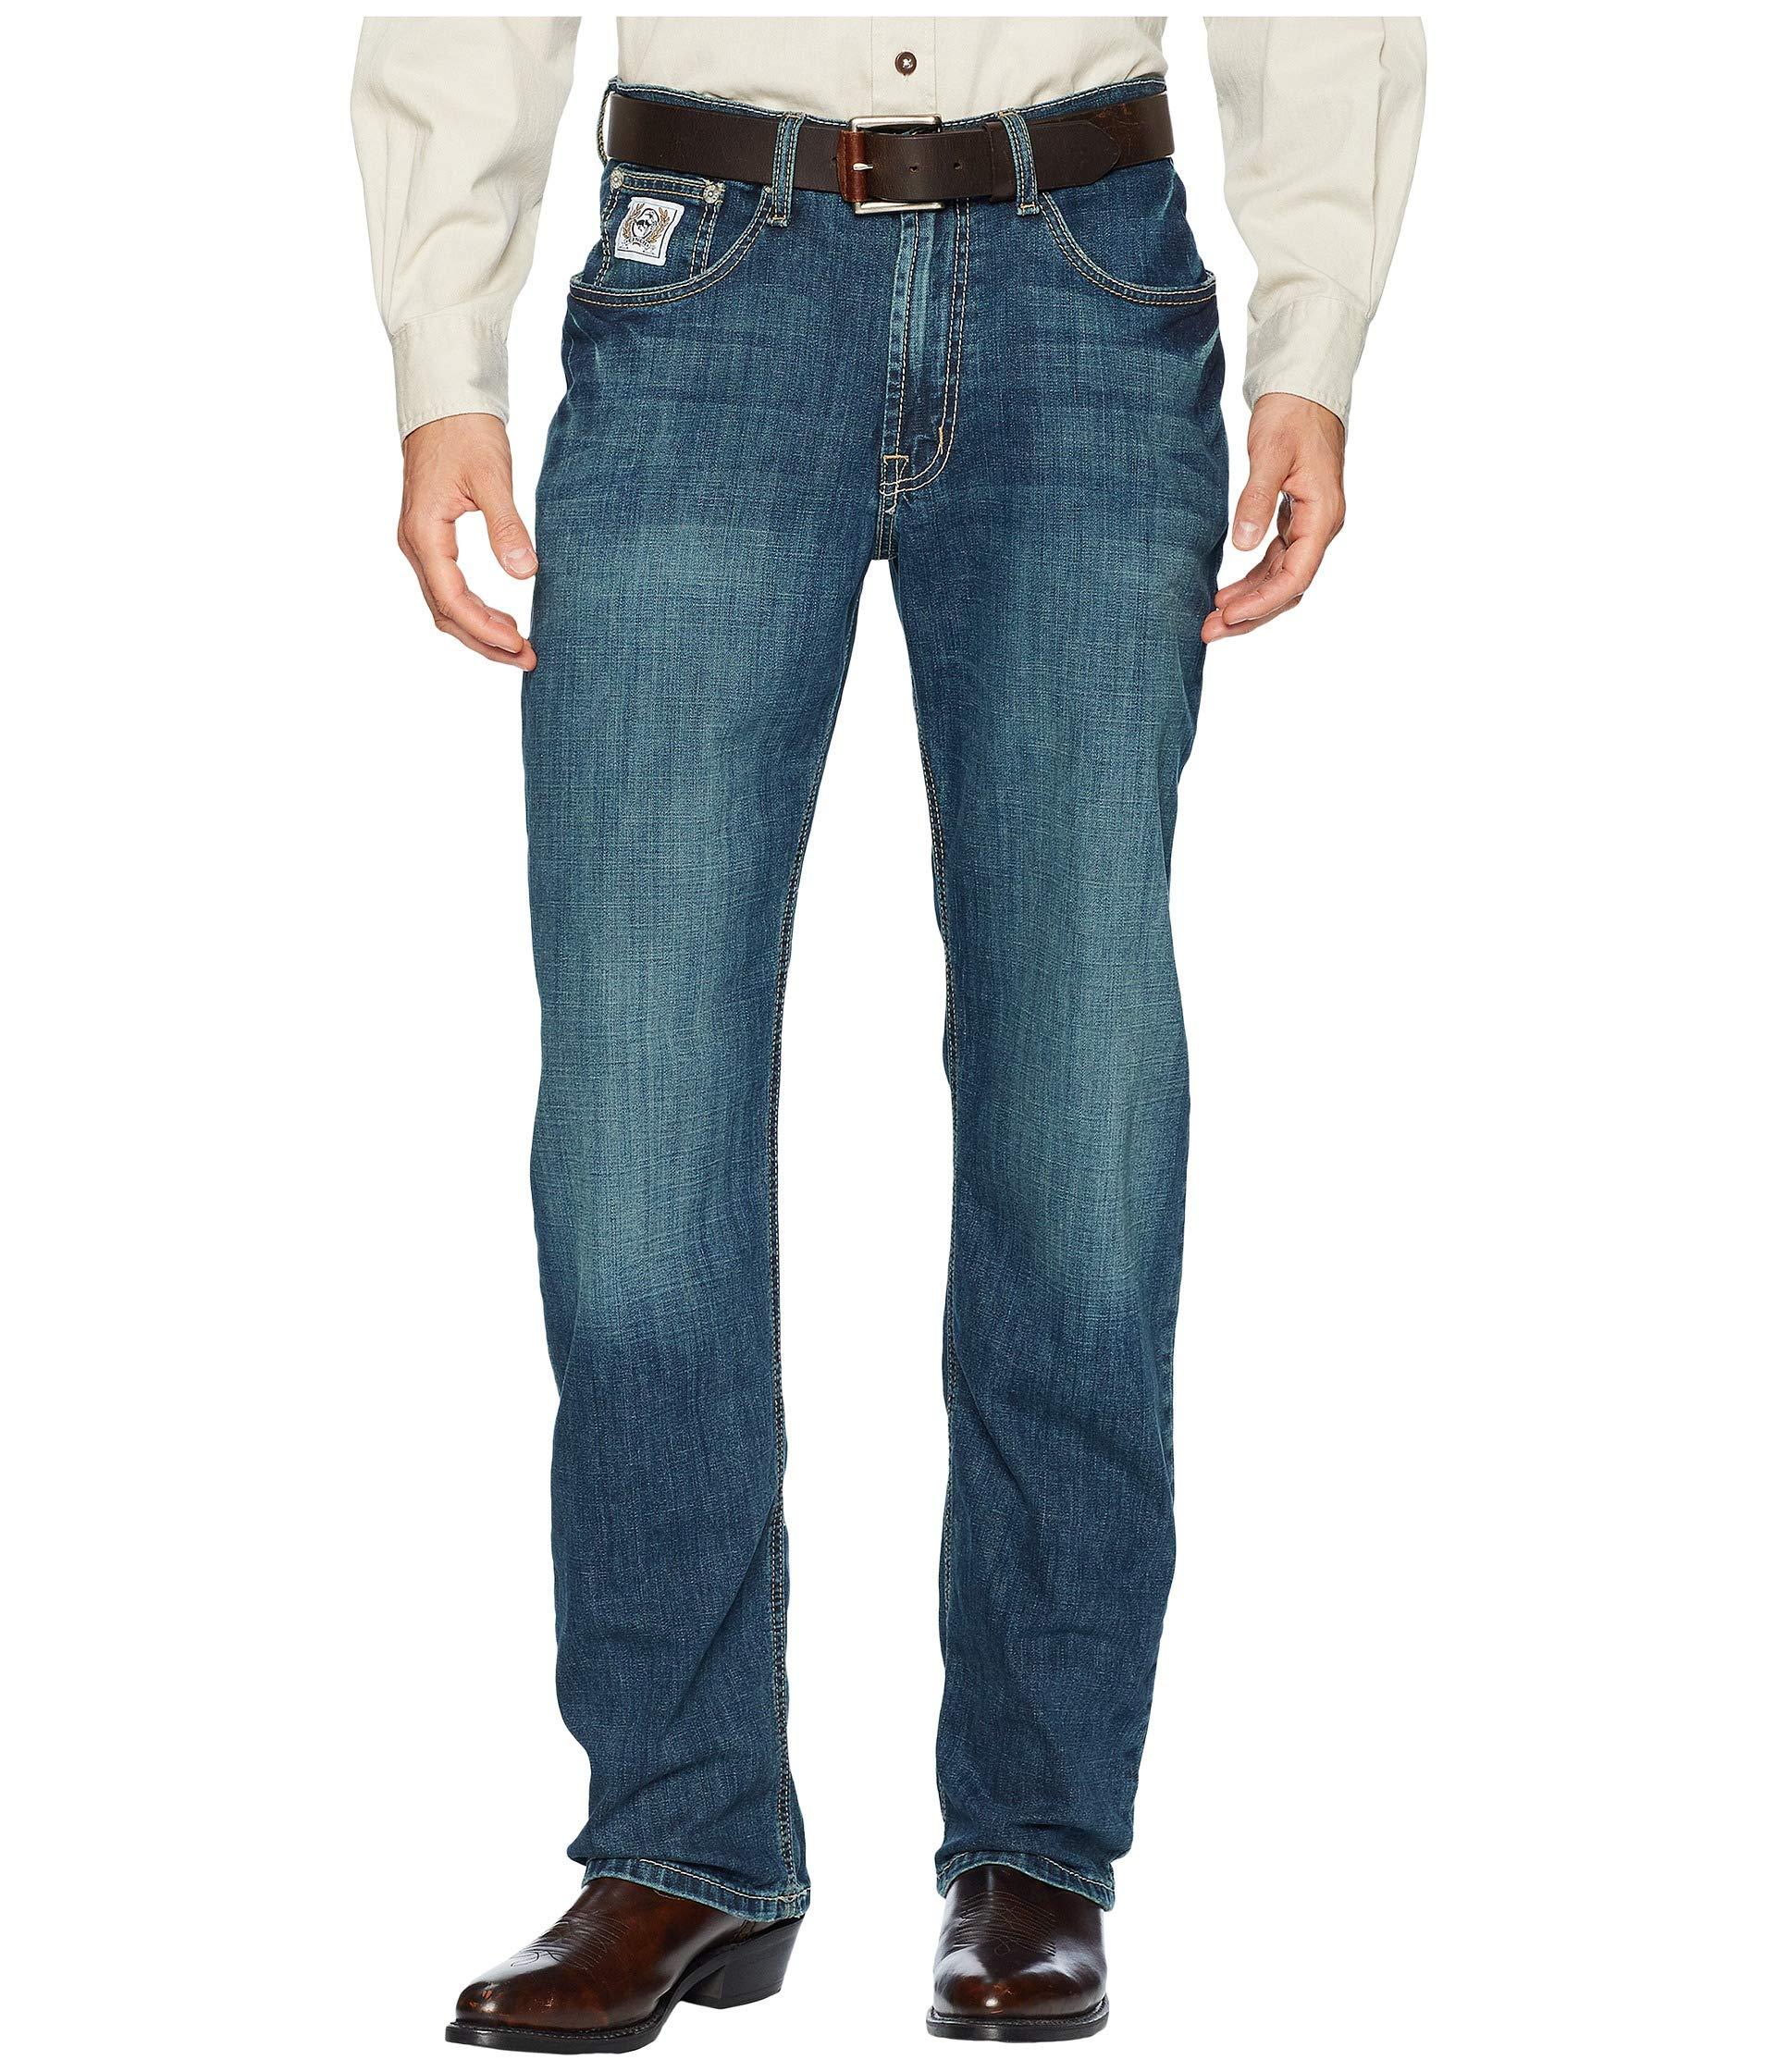 Cinch Men's White Label Relaxed Fit Jean, Medium Stonewash Performance Blue, 26x36